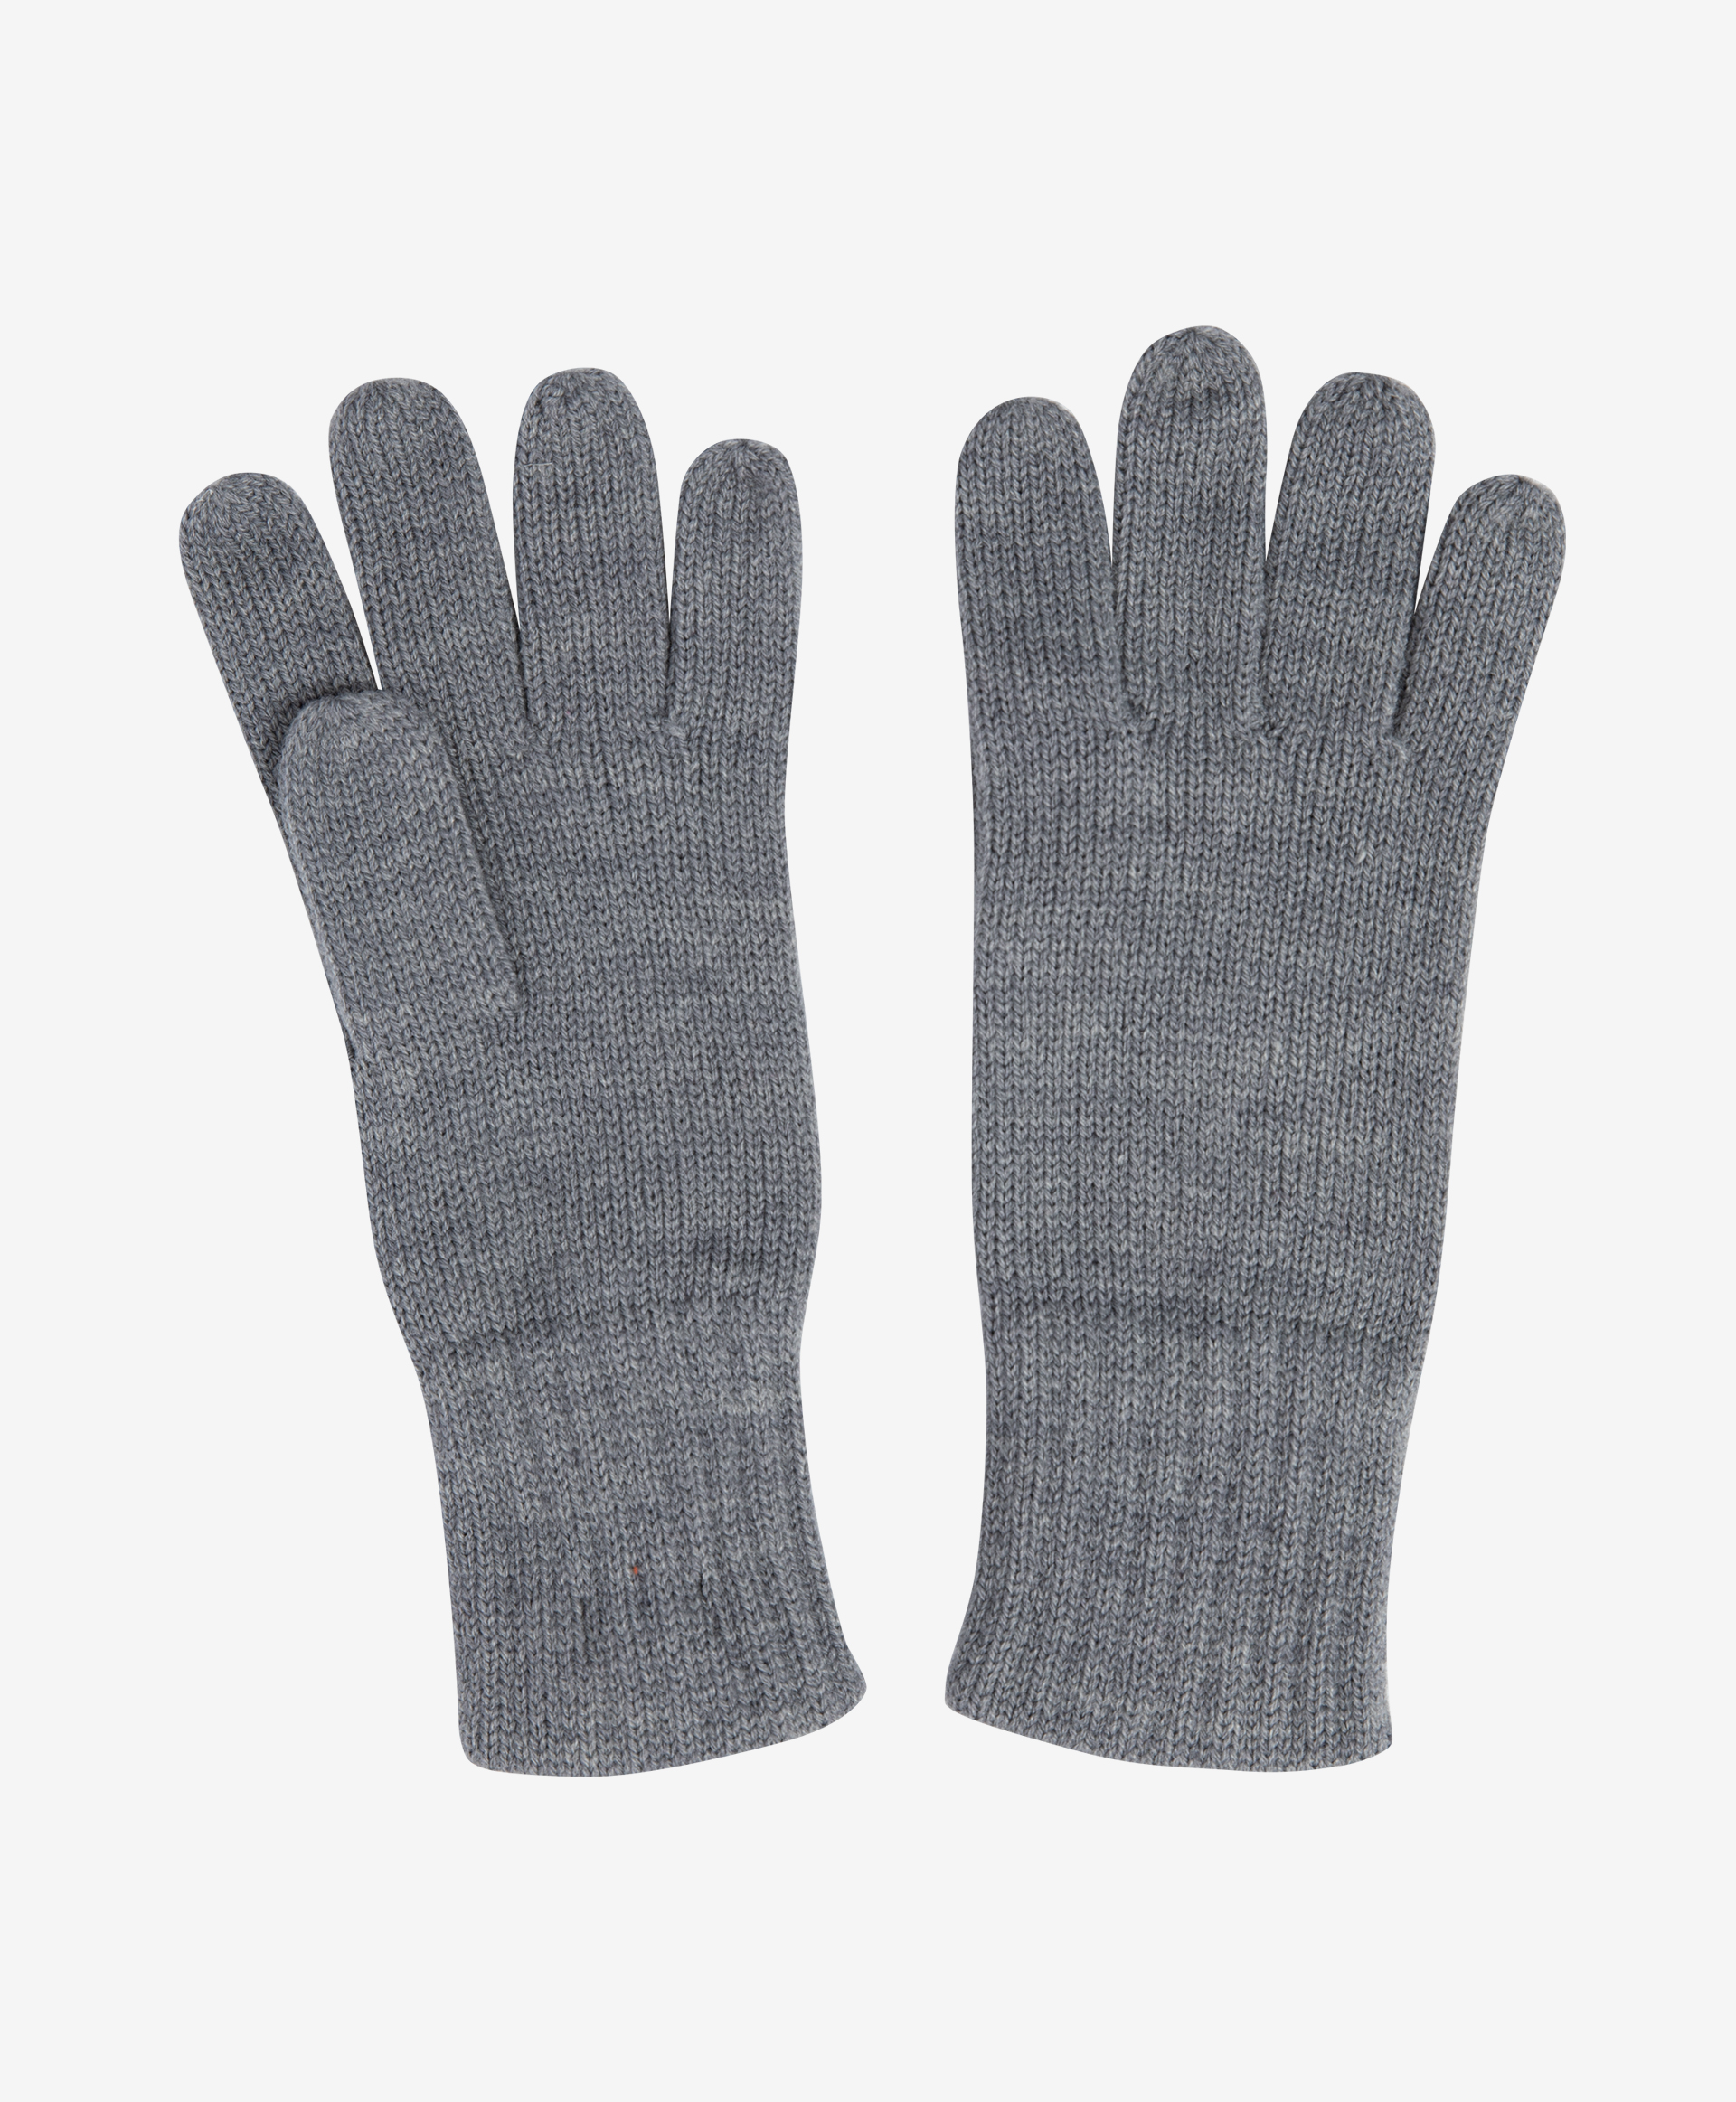 Перчатки вязаные серые Gulliver 22007GJC7603